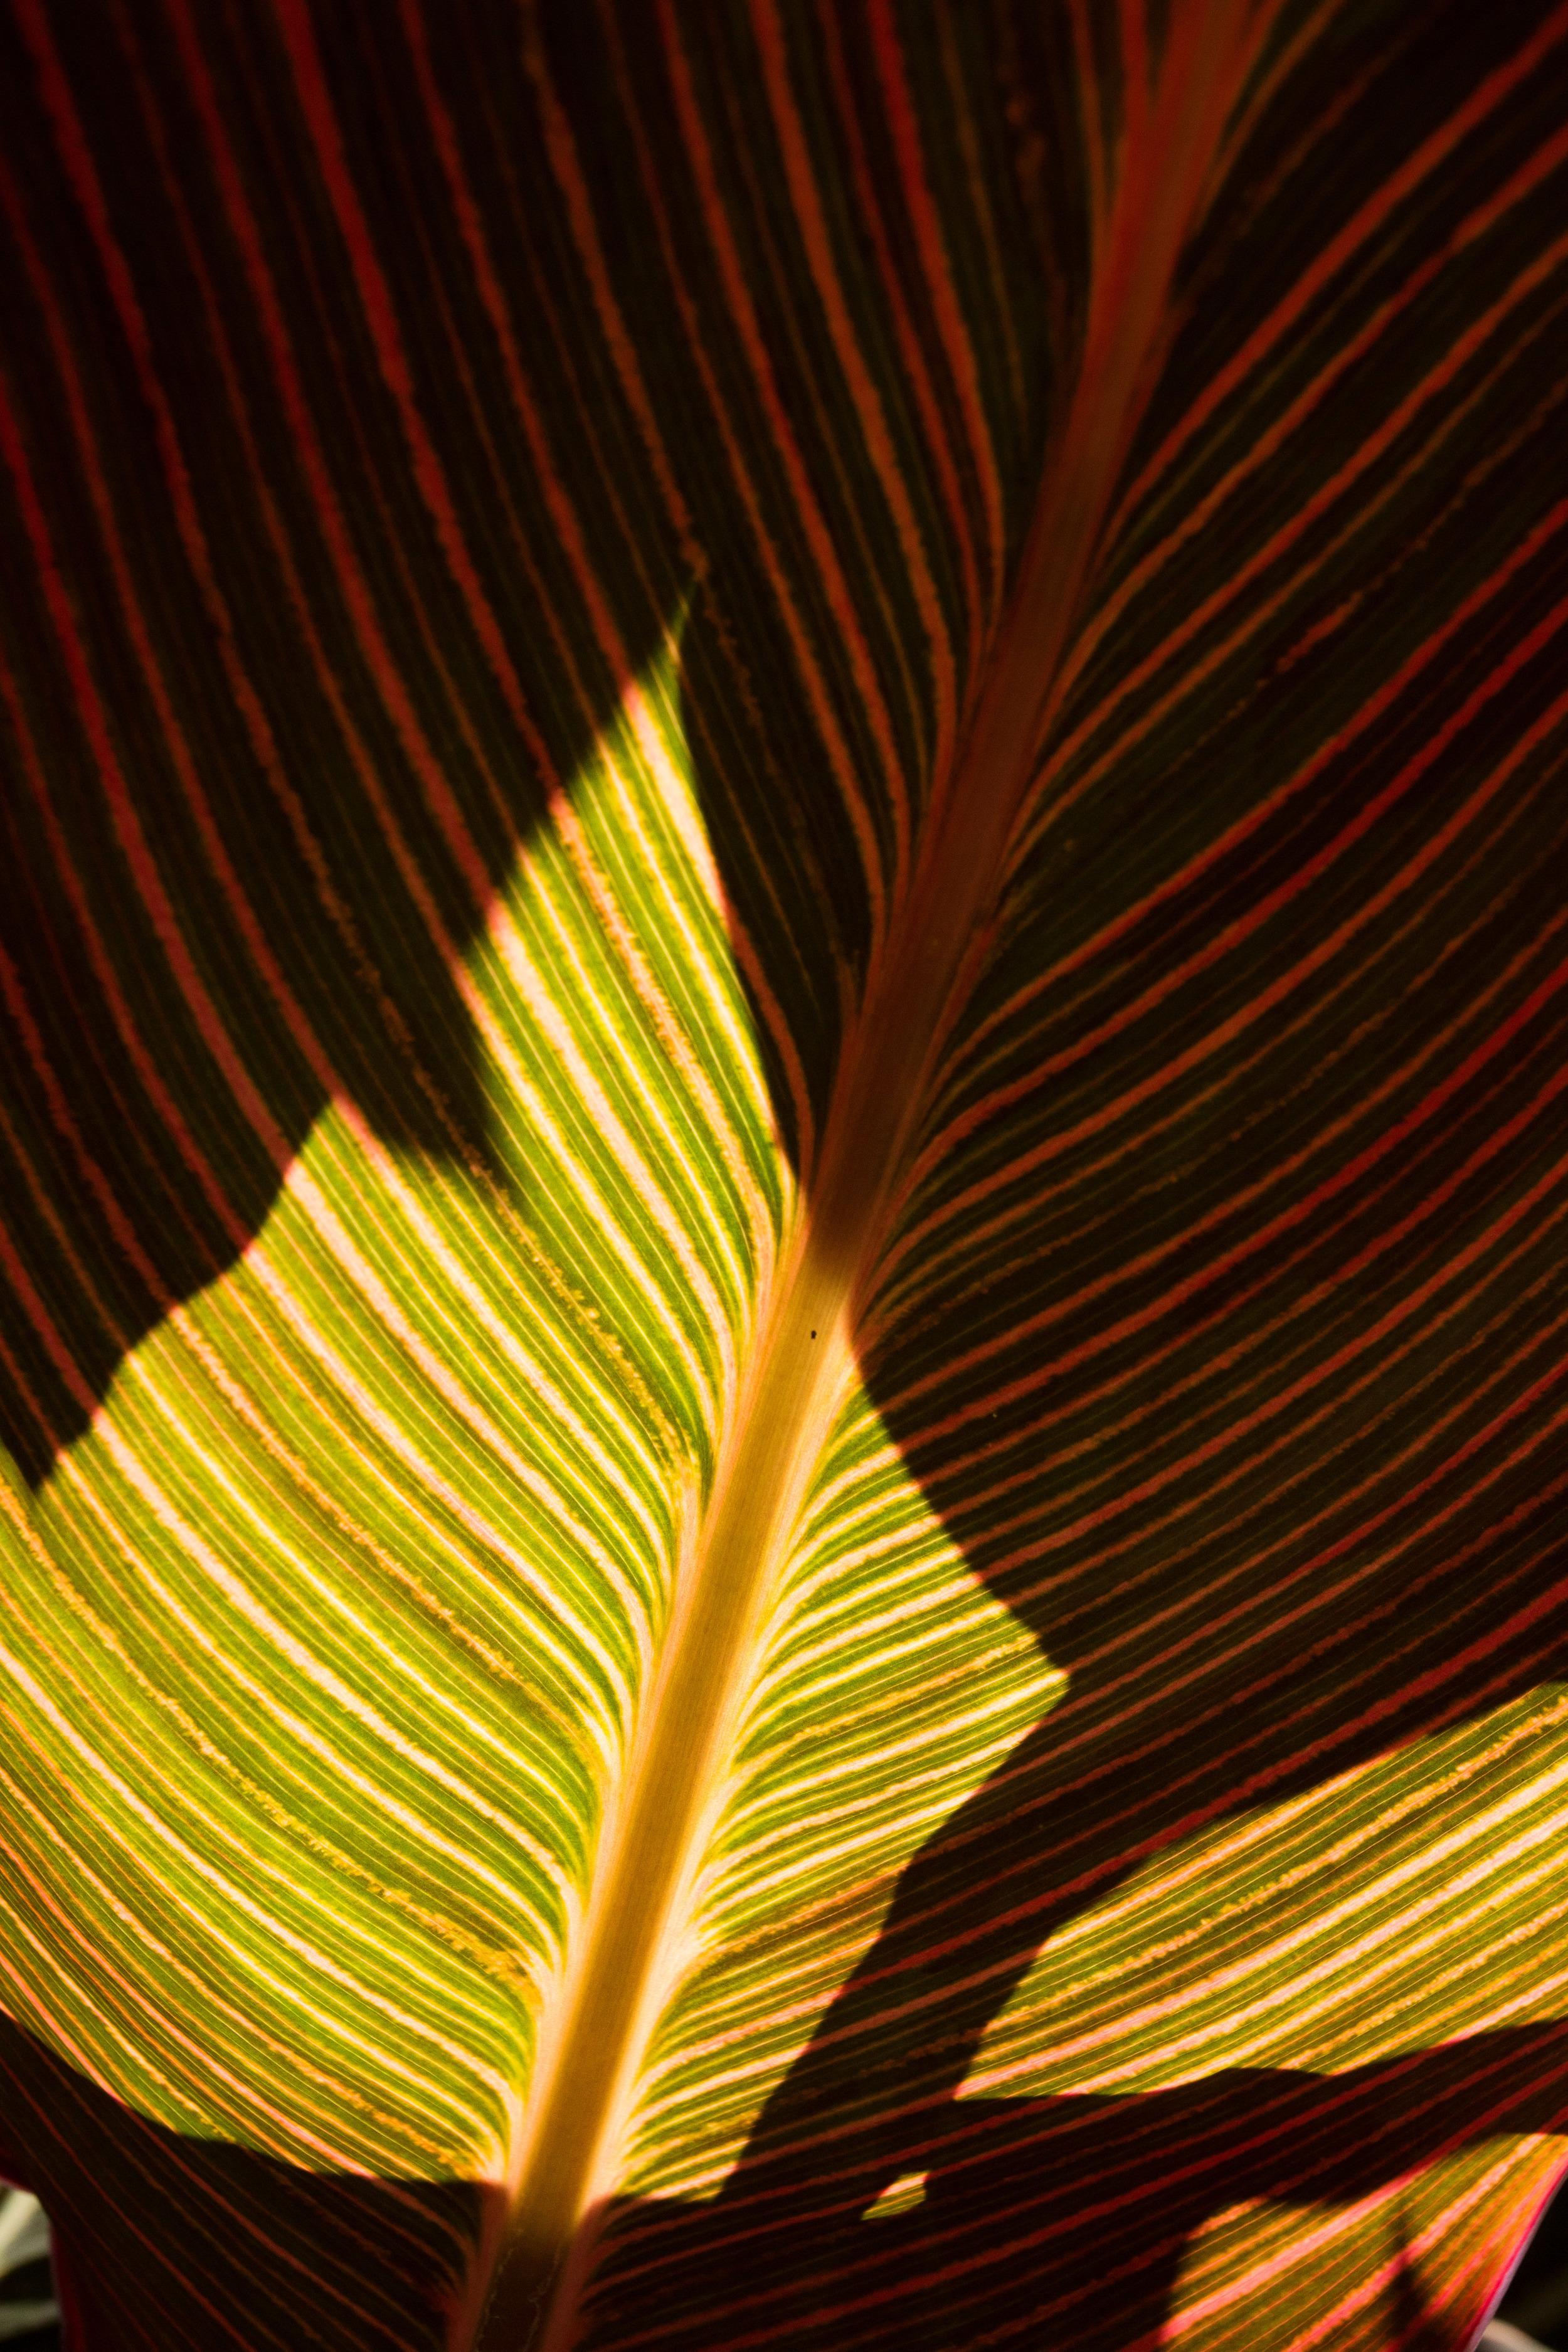 Shadows and patterns on a backlit leaf.